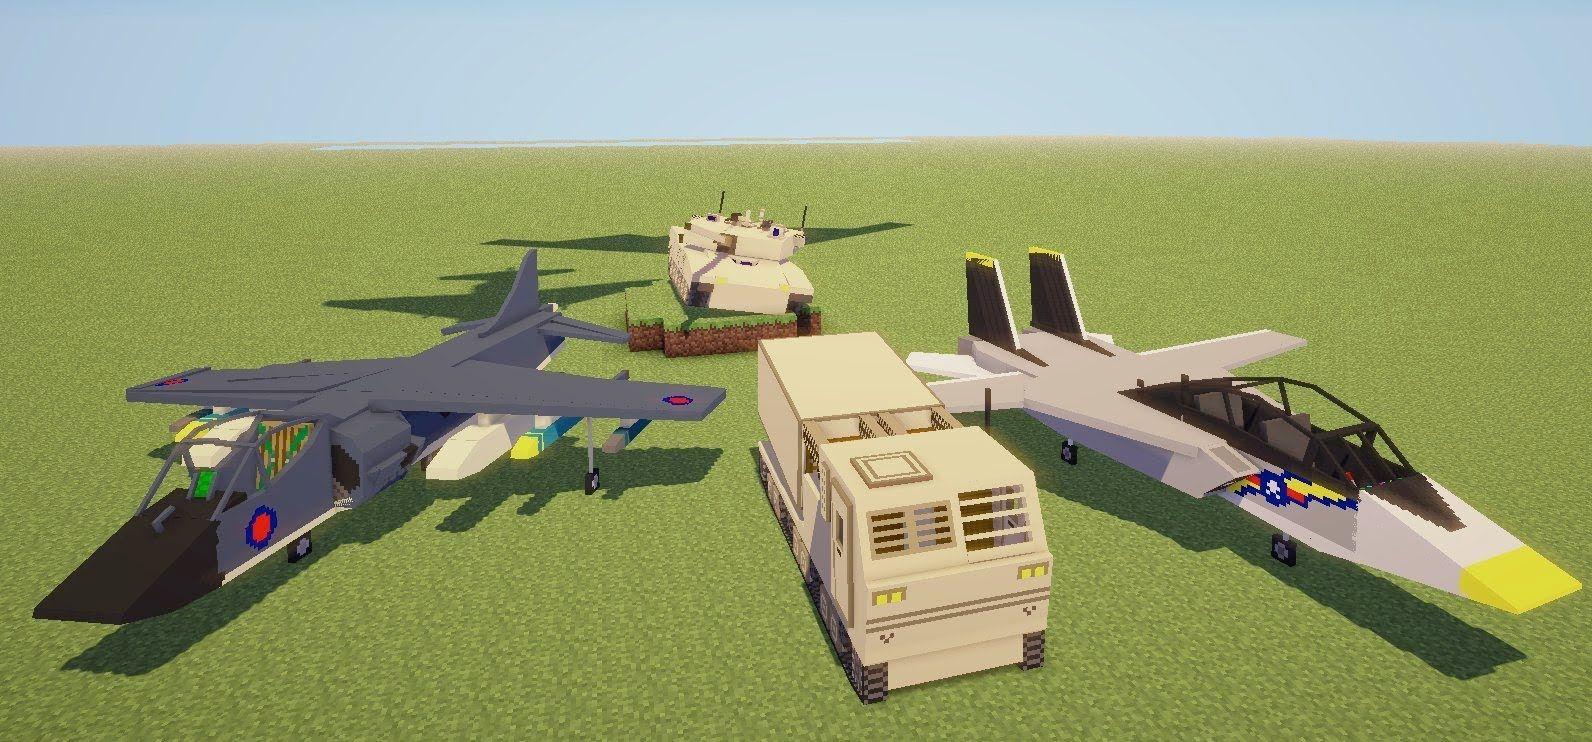 Minecraft Flan S Mod Taskforce 51 Vehicle Pack Minecraft Minecraft 1 Mod